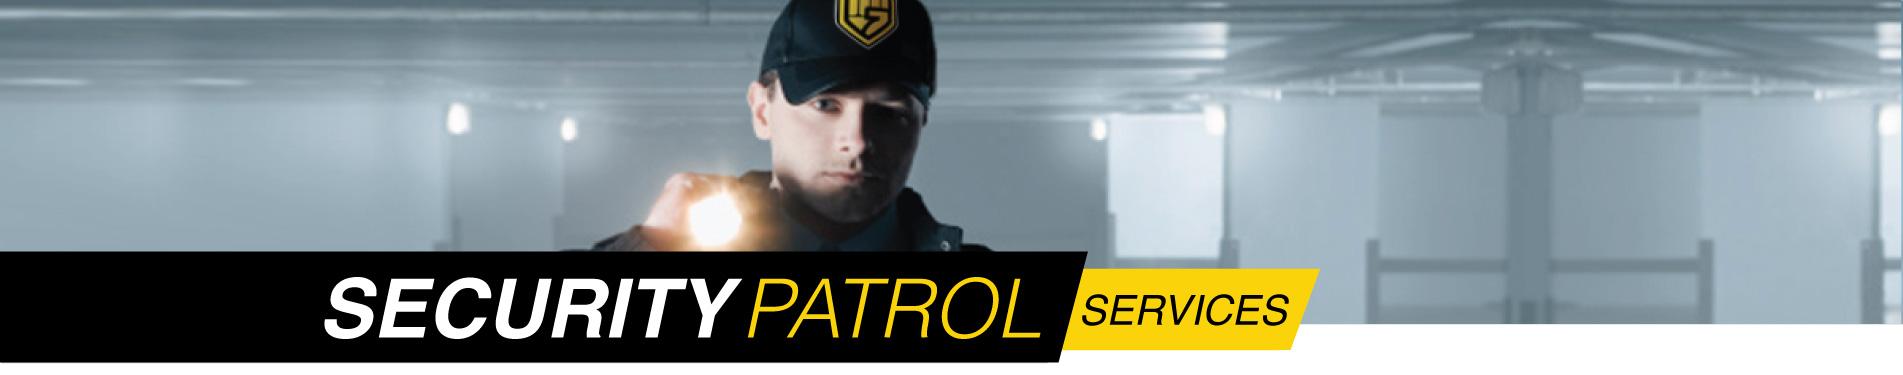 Houston area security patrol services